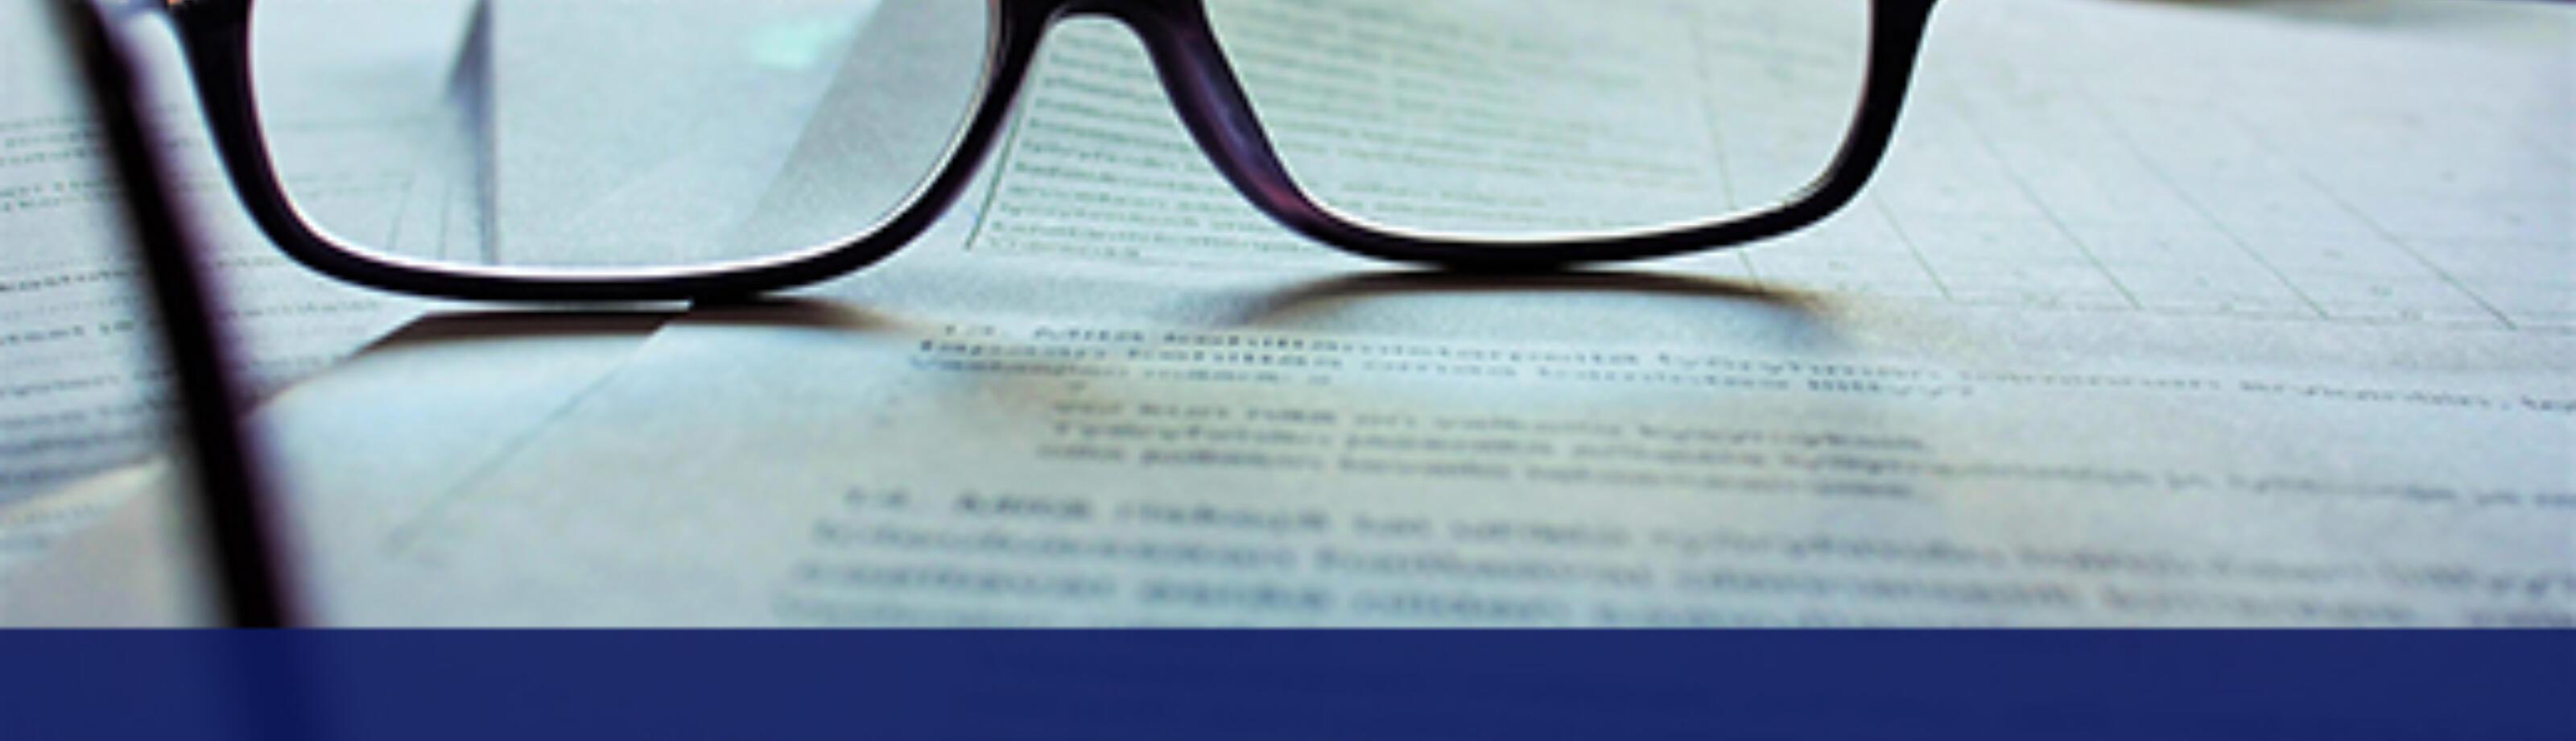 Blog beslag vs faillissement Linked IN